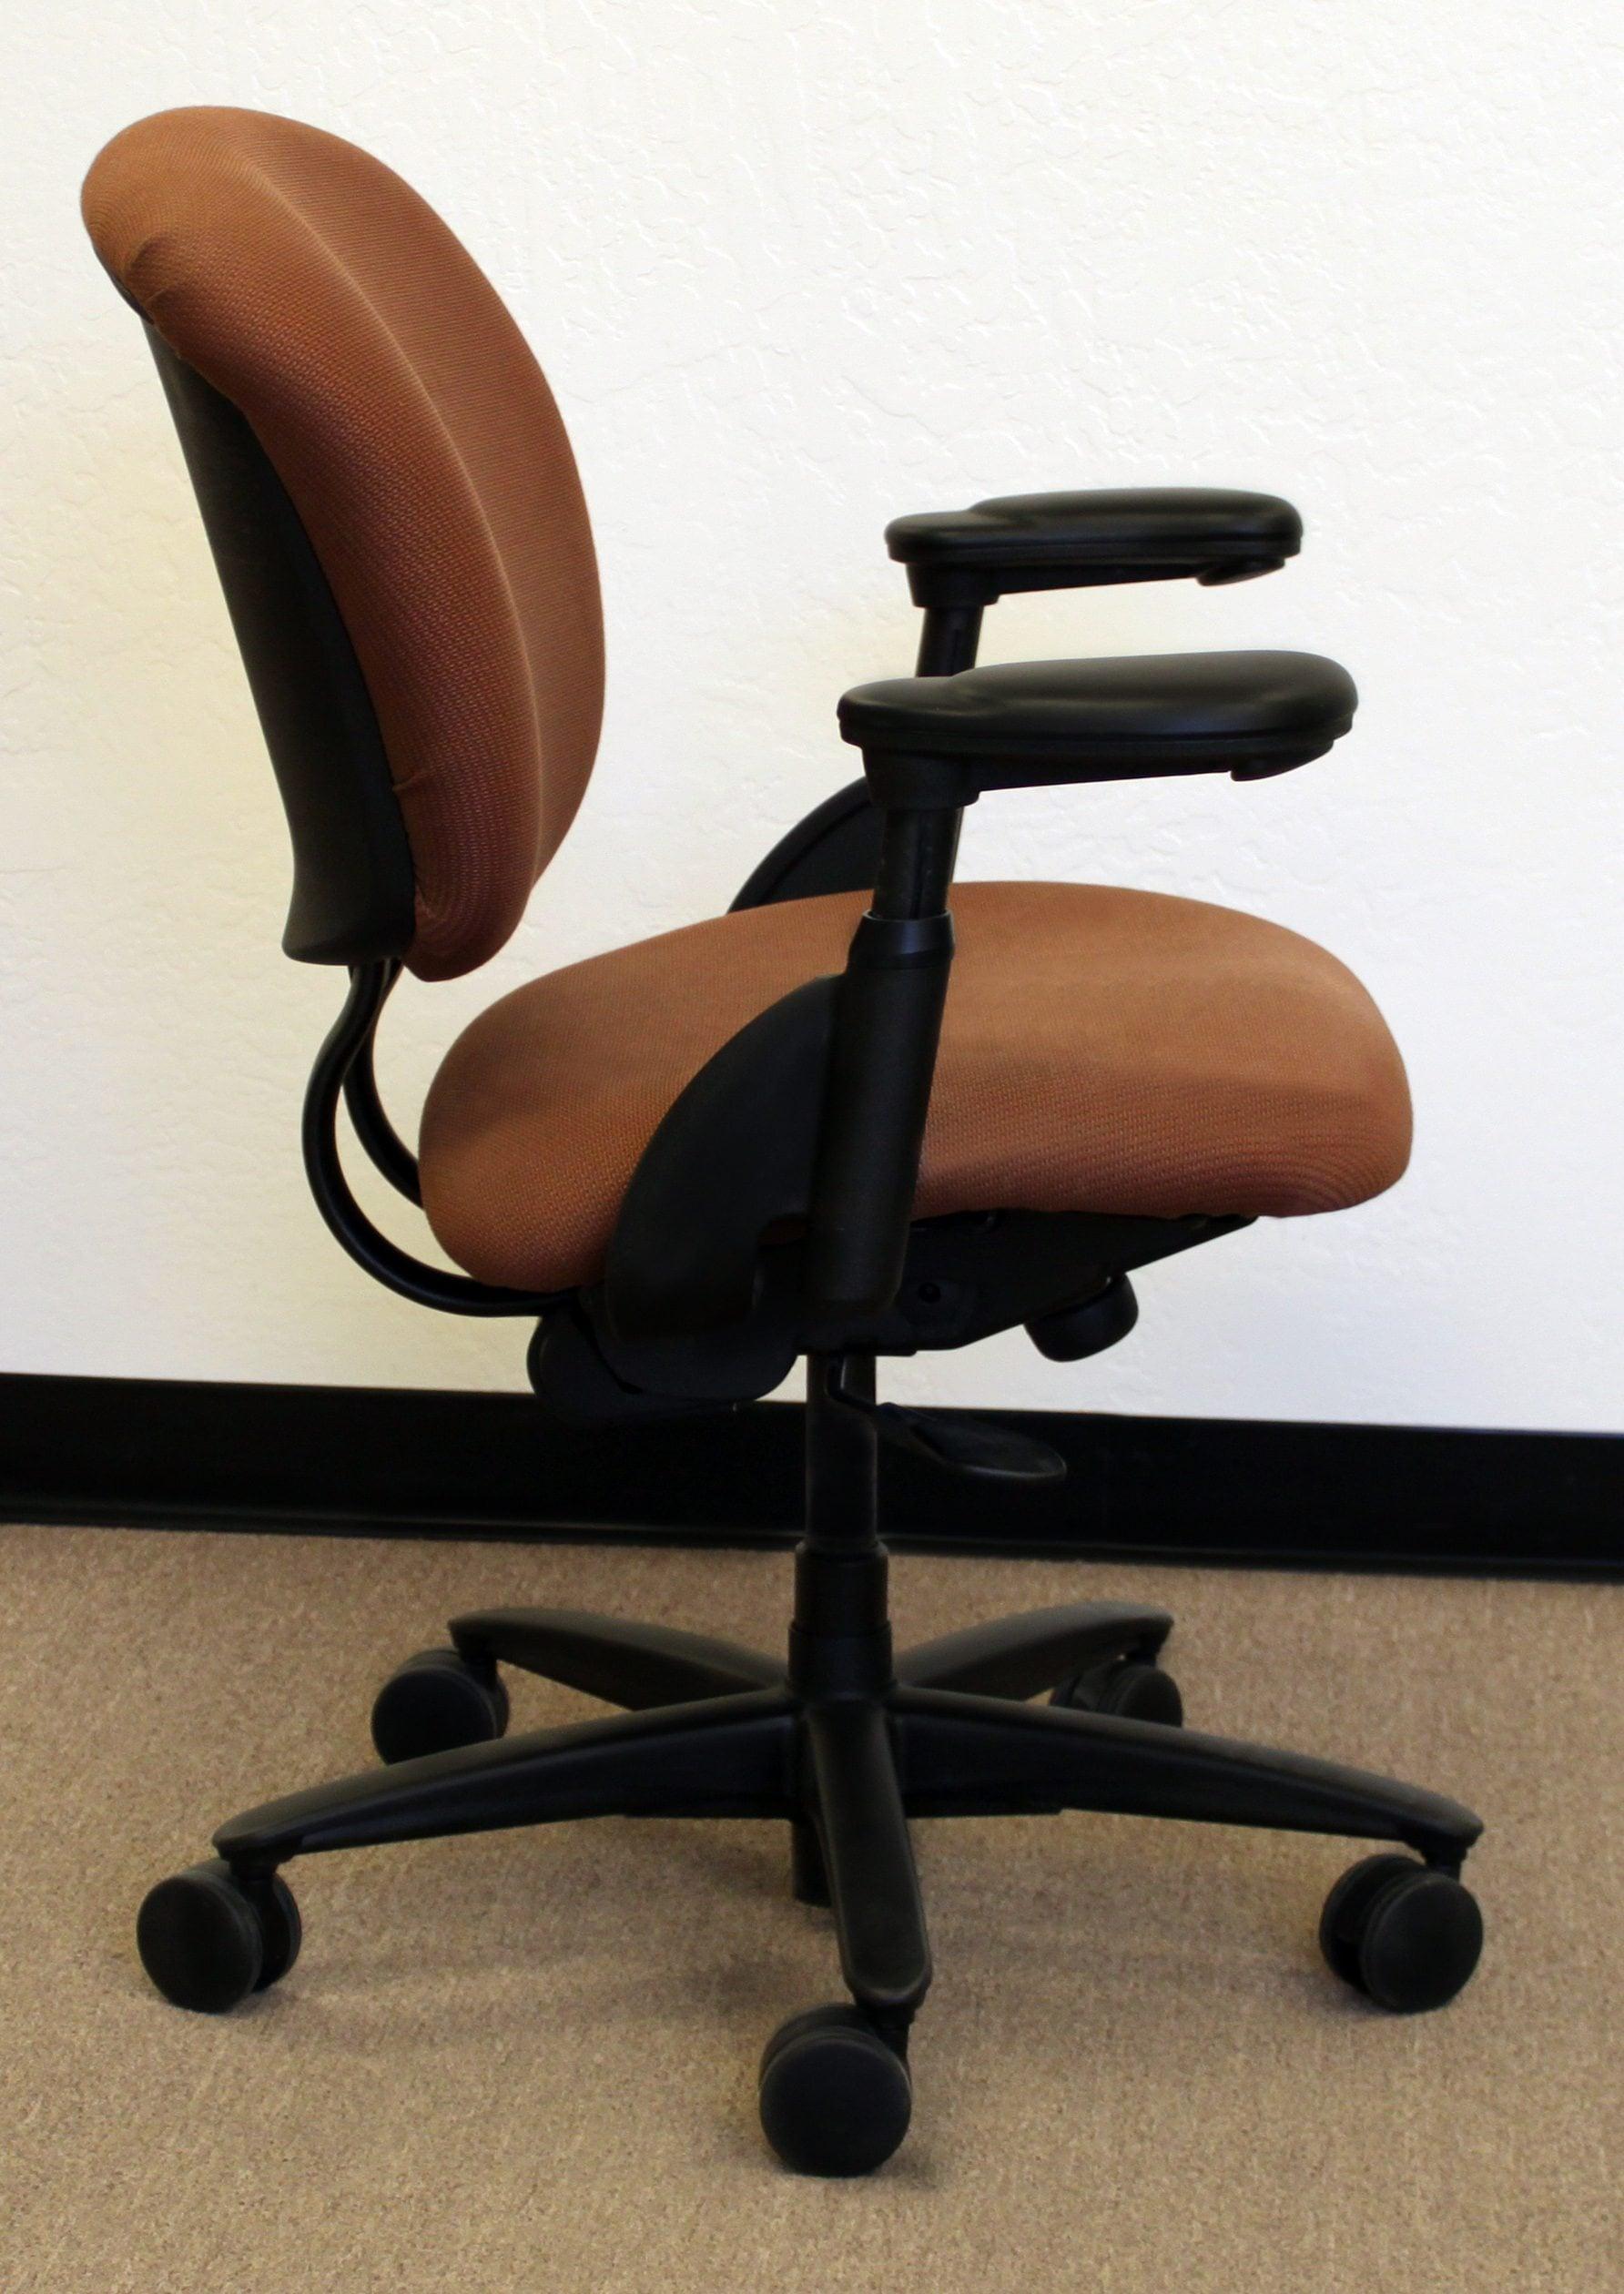 xl desk chair best feeding for infants haworth improv used task rust print national